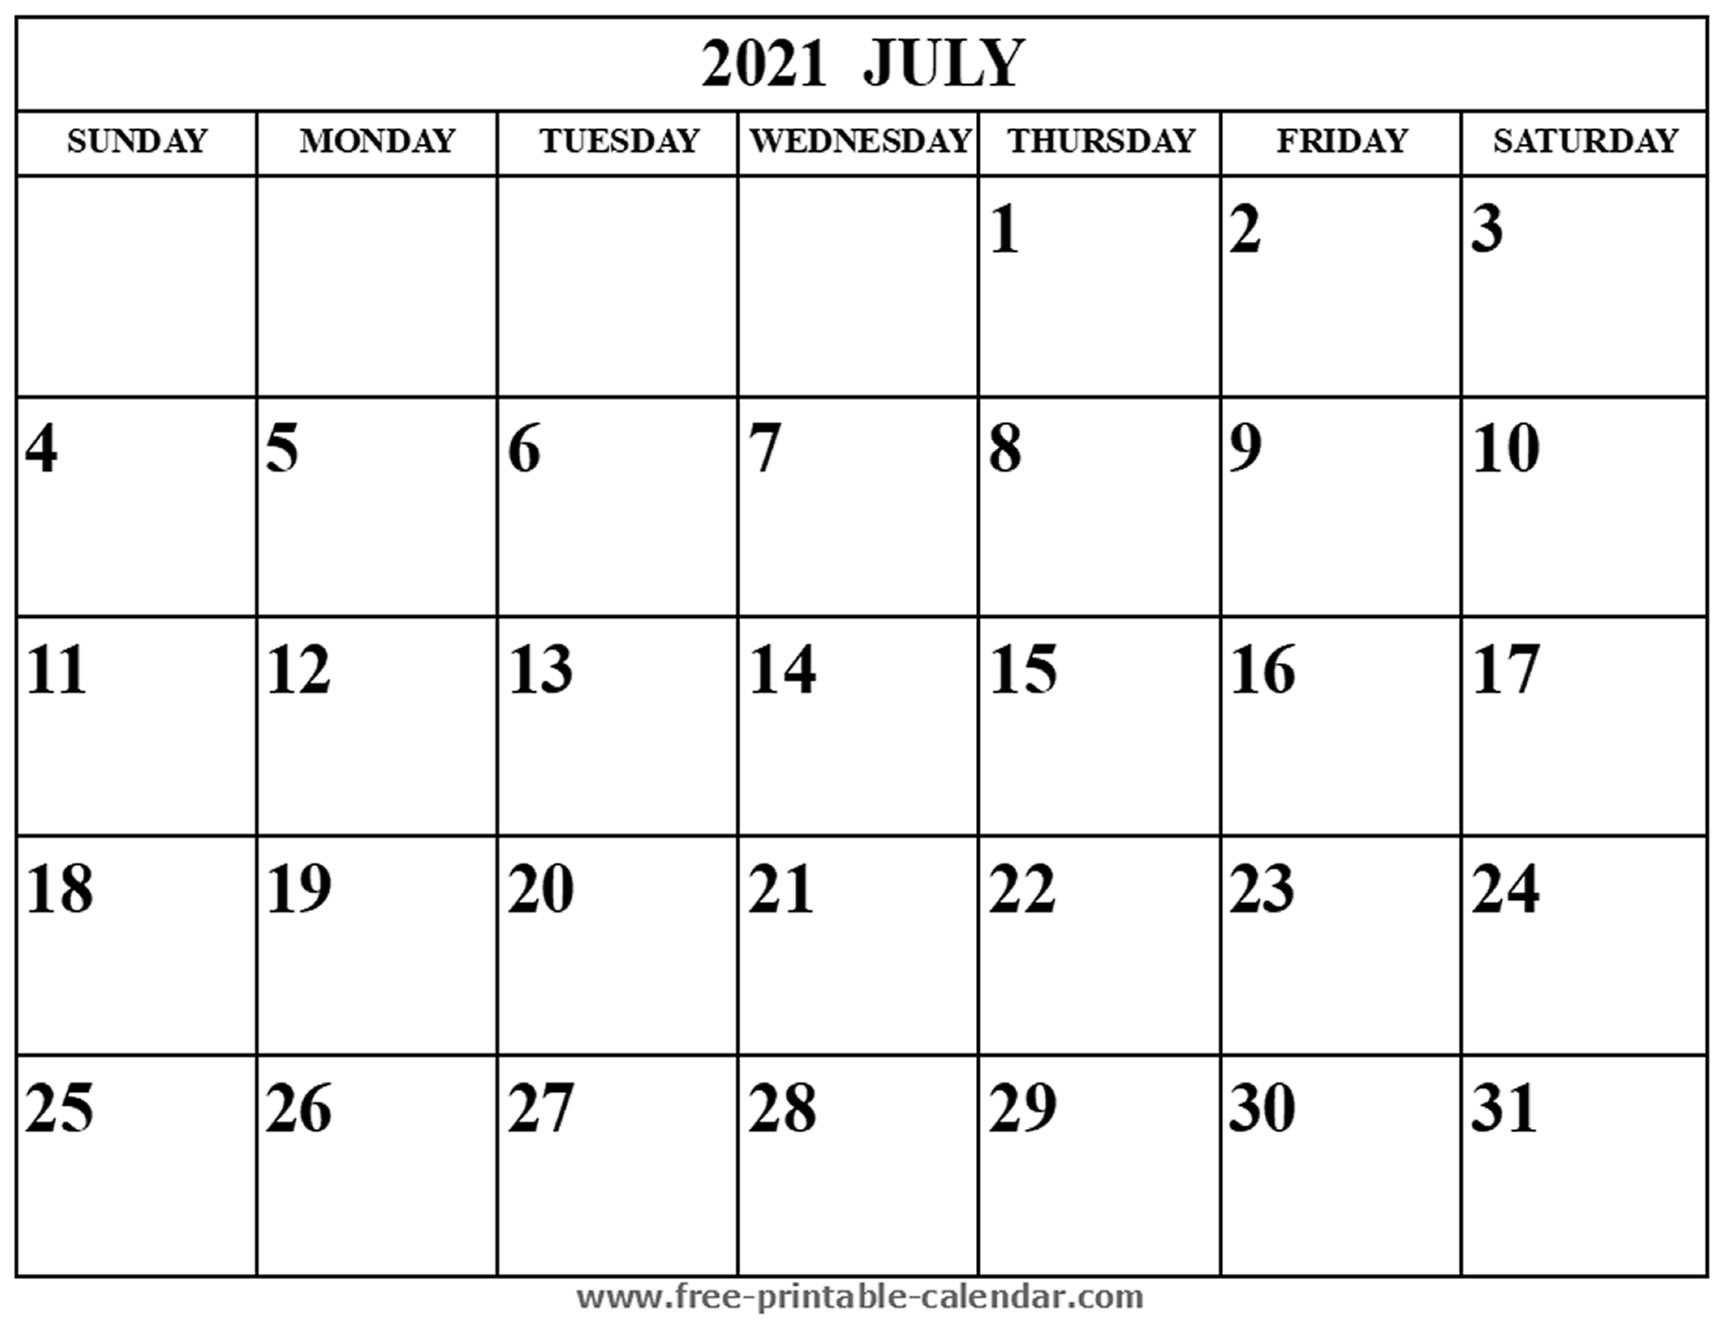 Blank July 2021 Calendar Free Printable Calendar